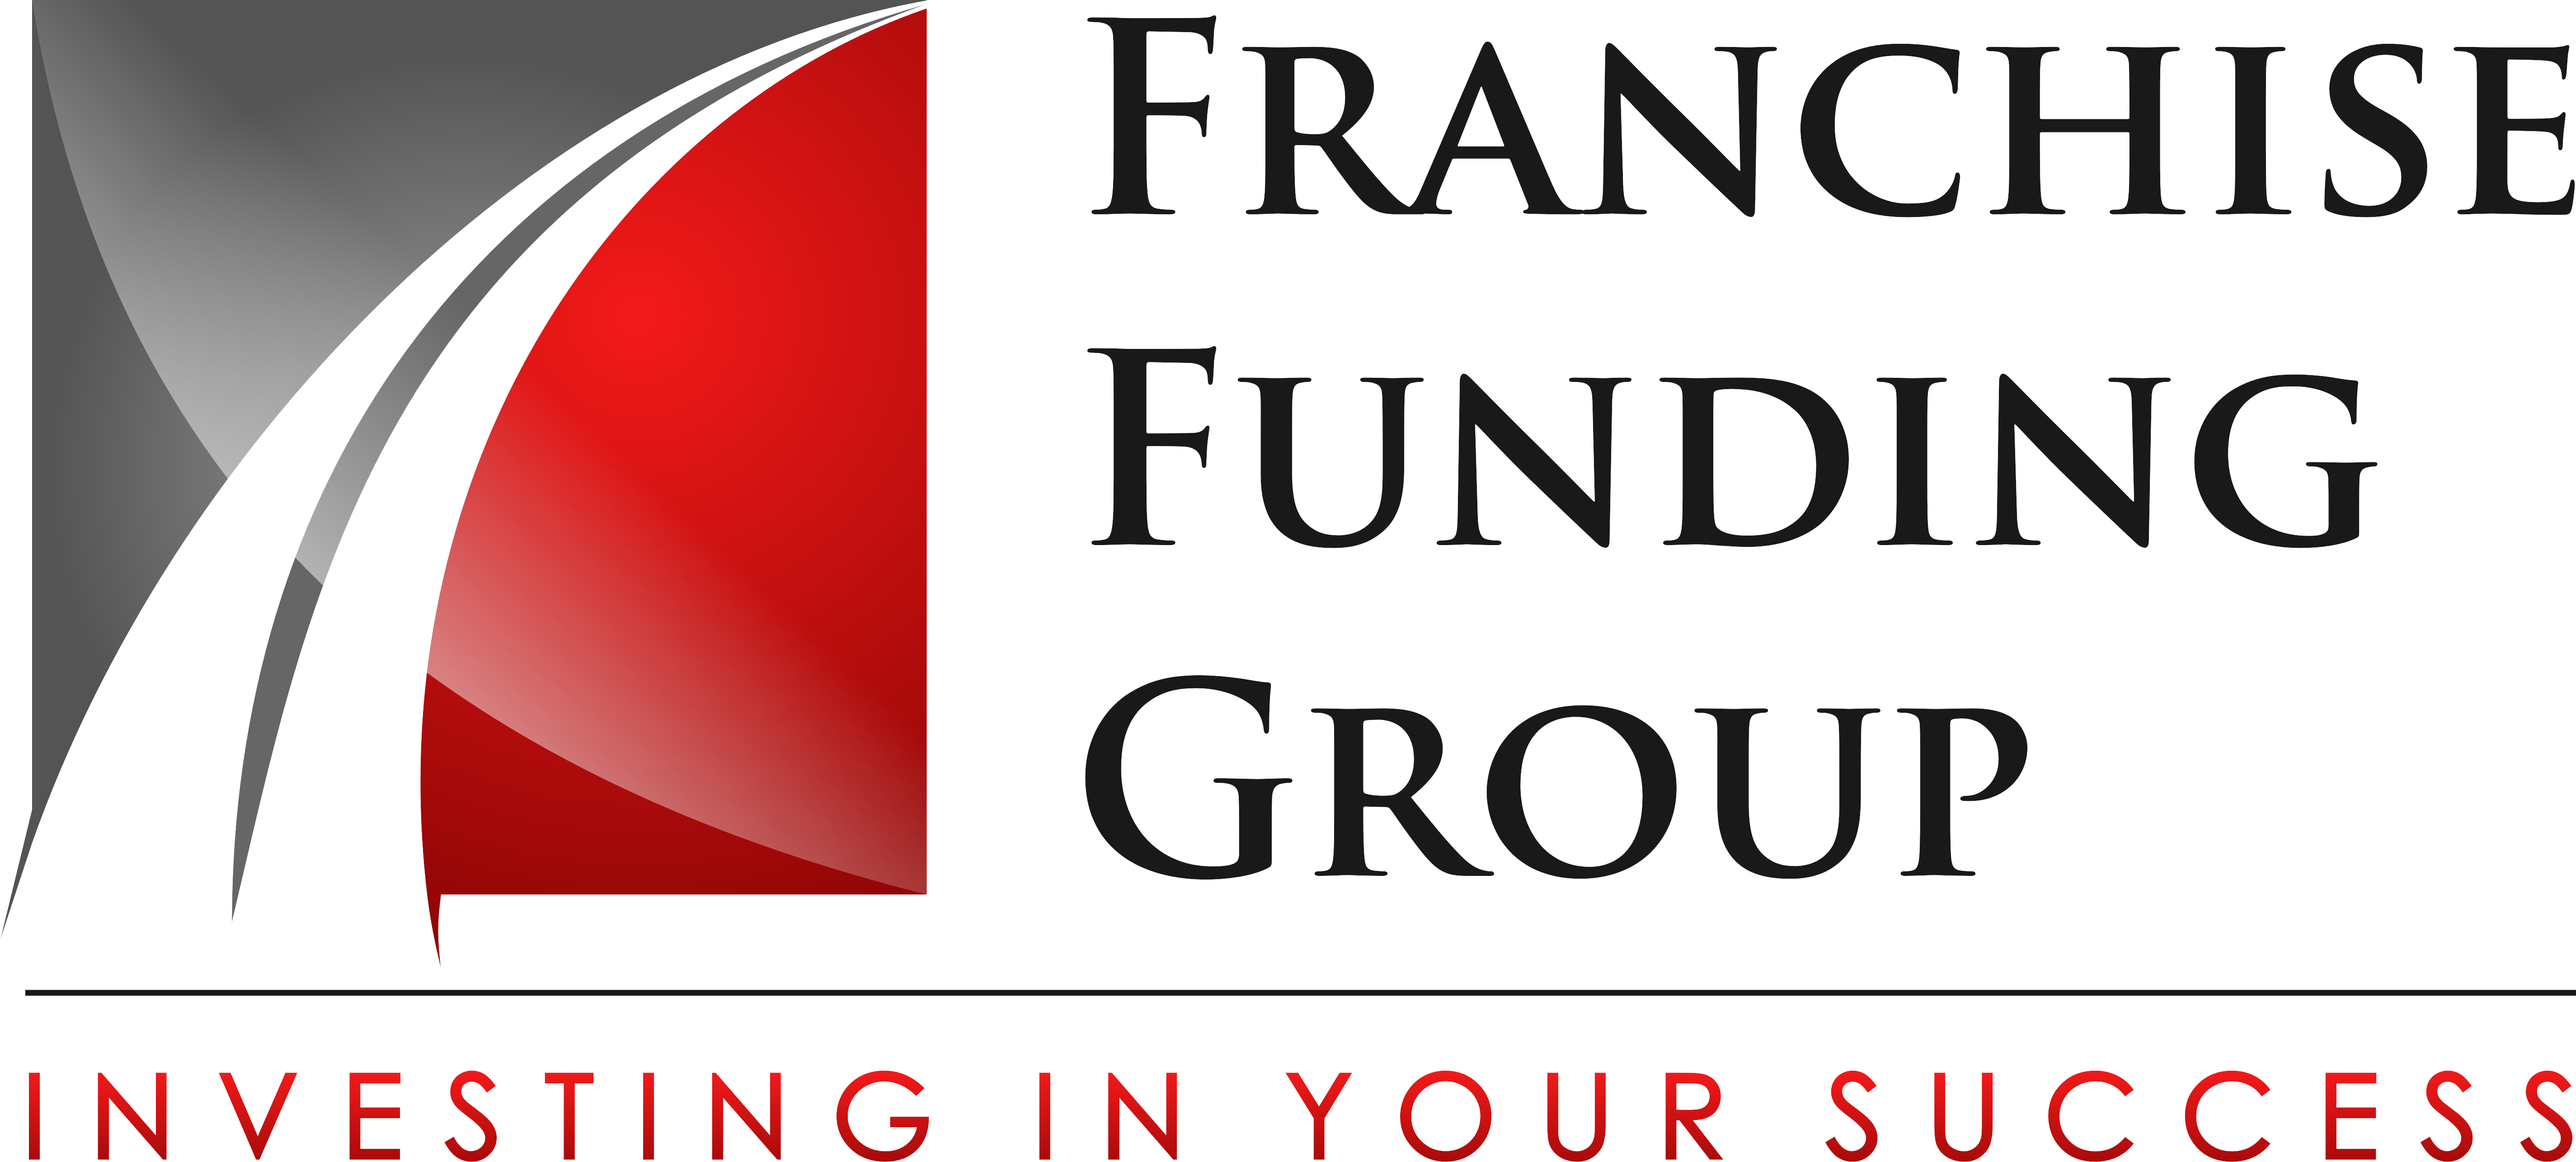 Franchise Funding Group, LLC